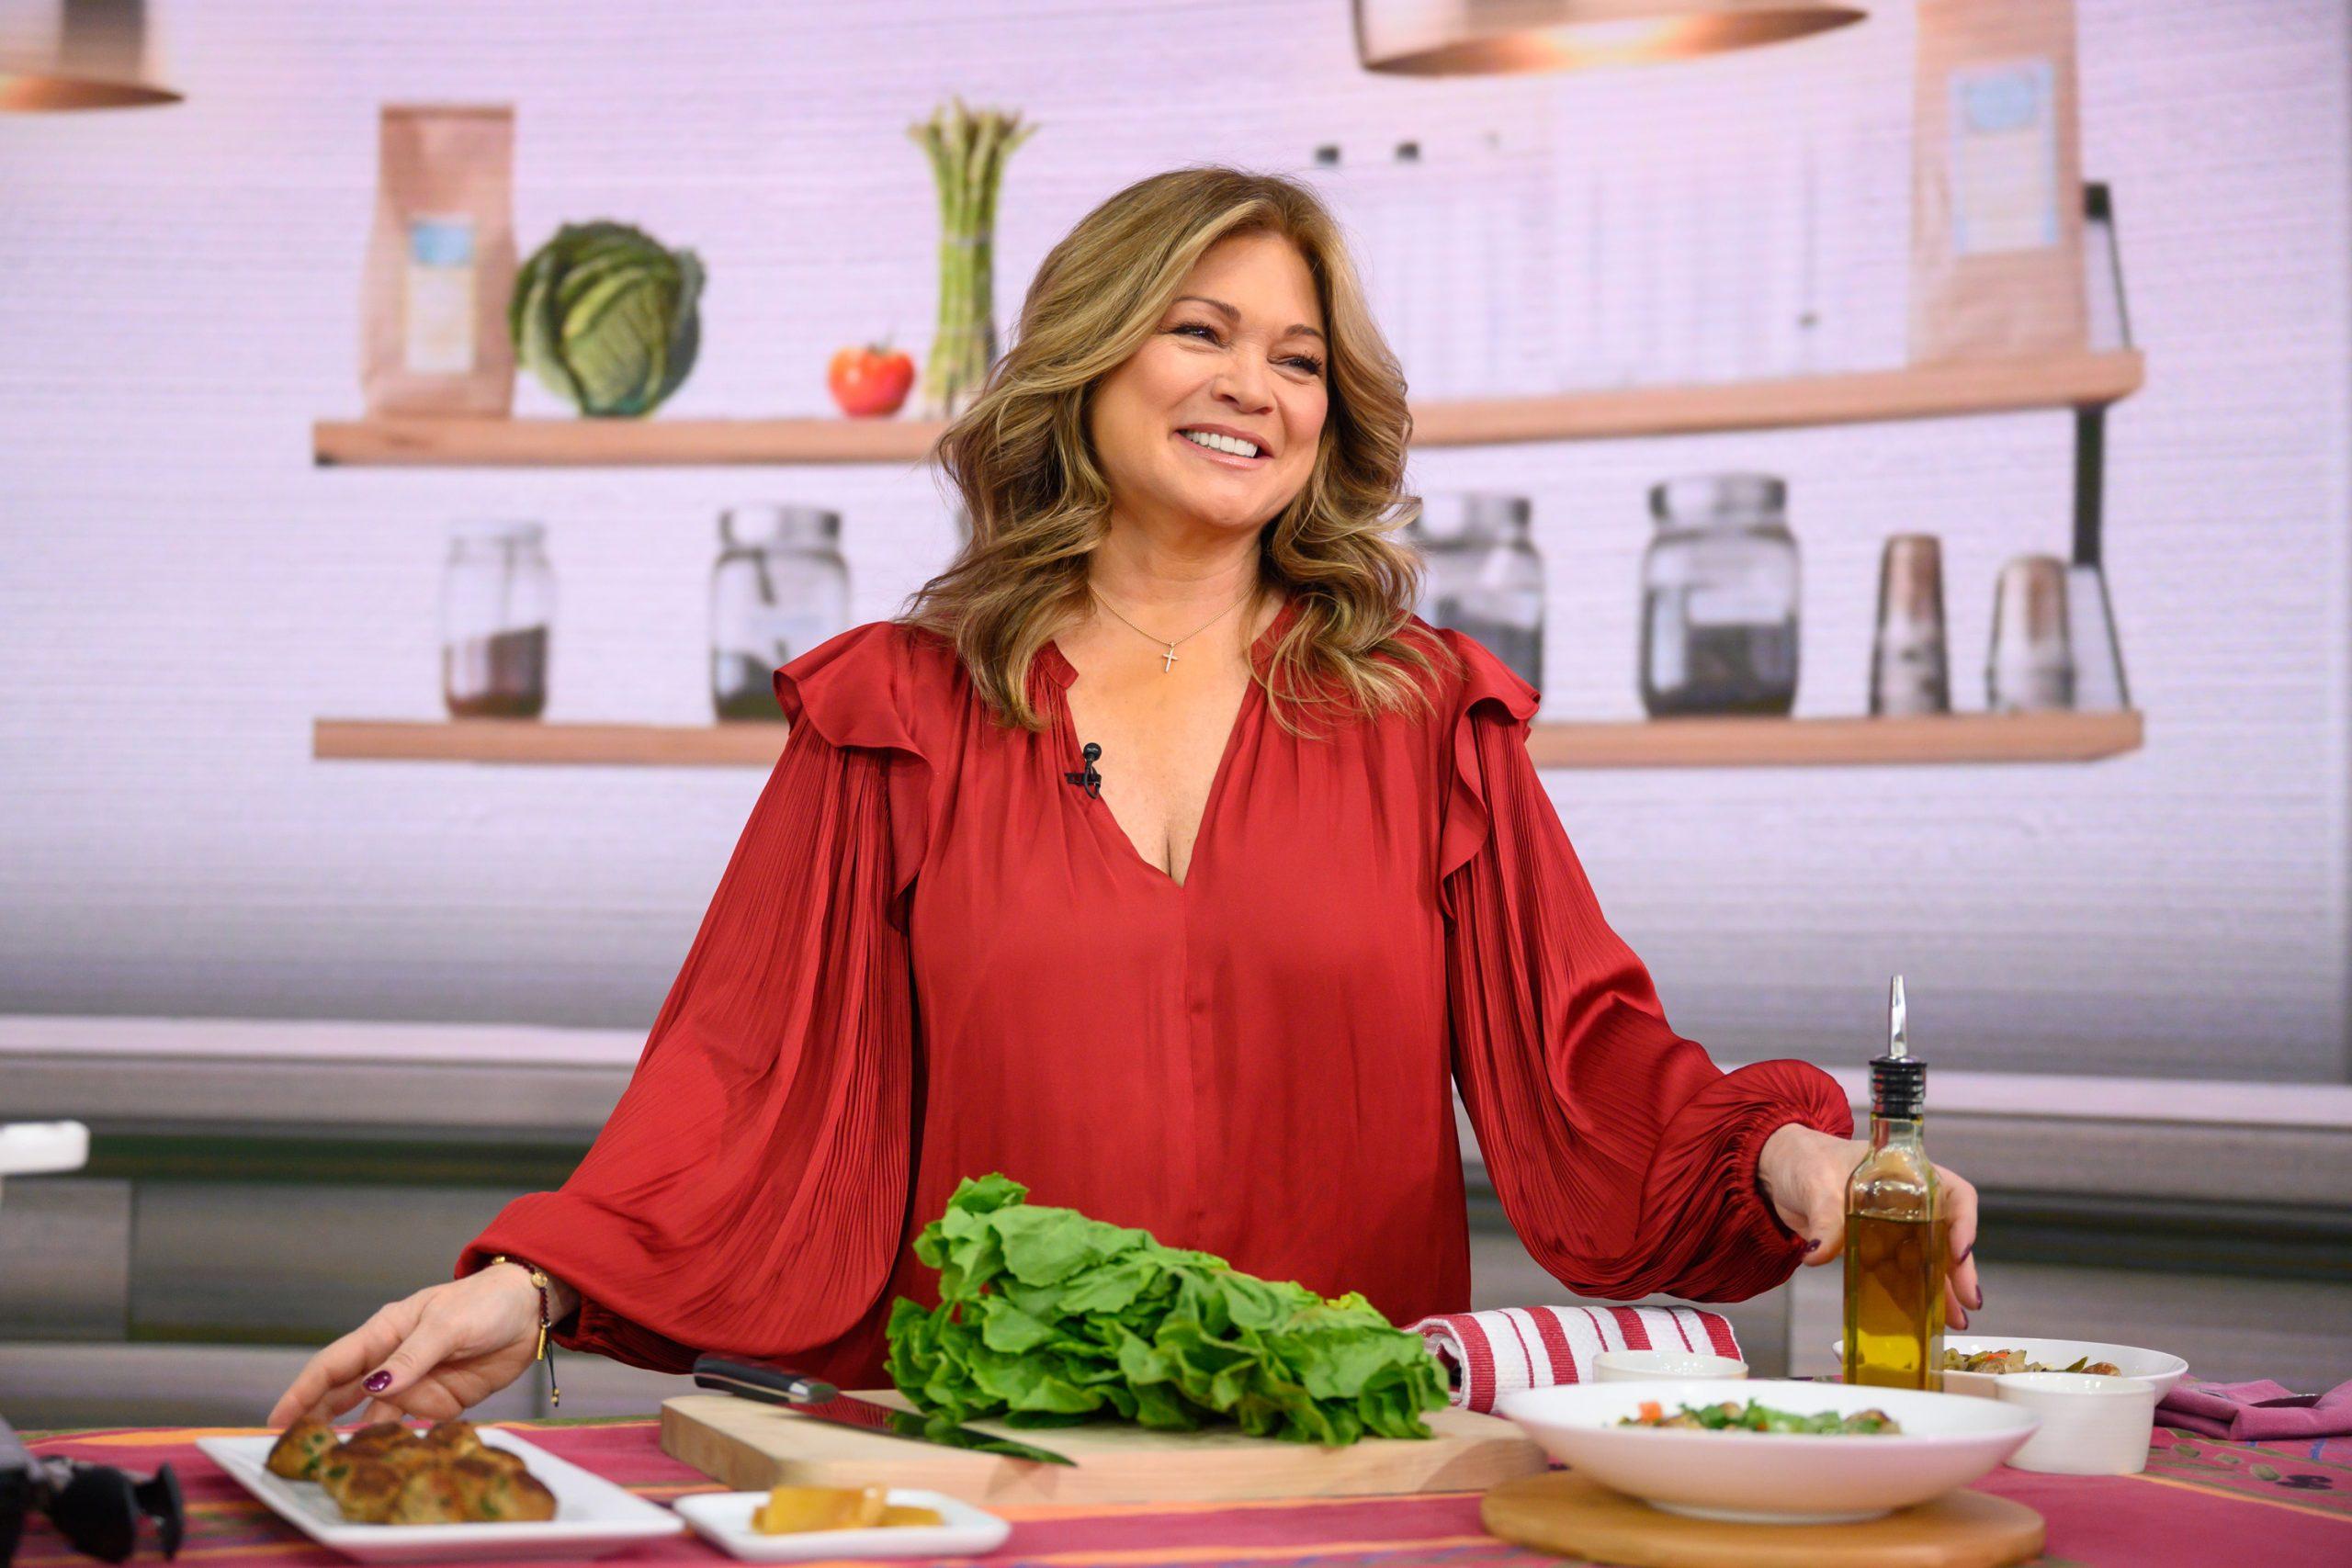 Food Network personality Valerie Bertinelli